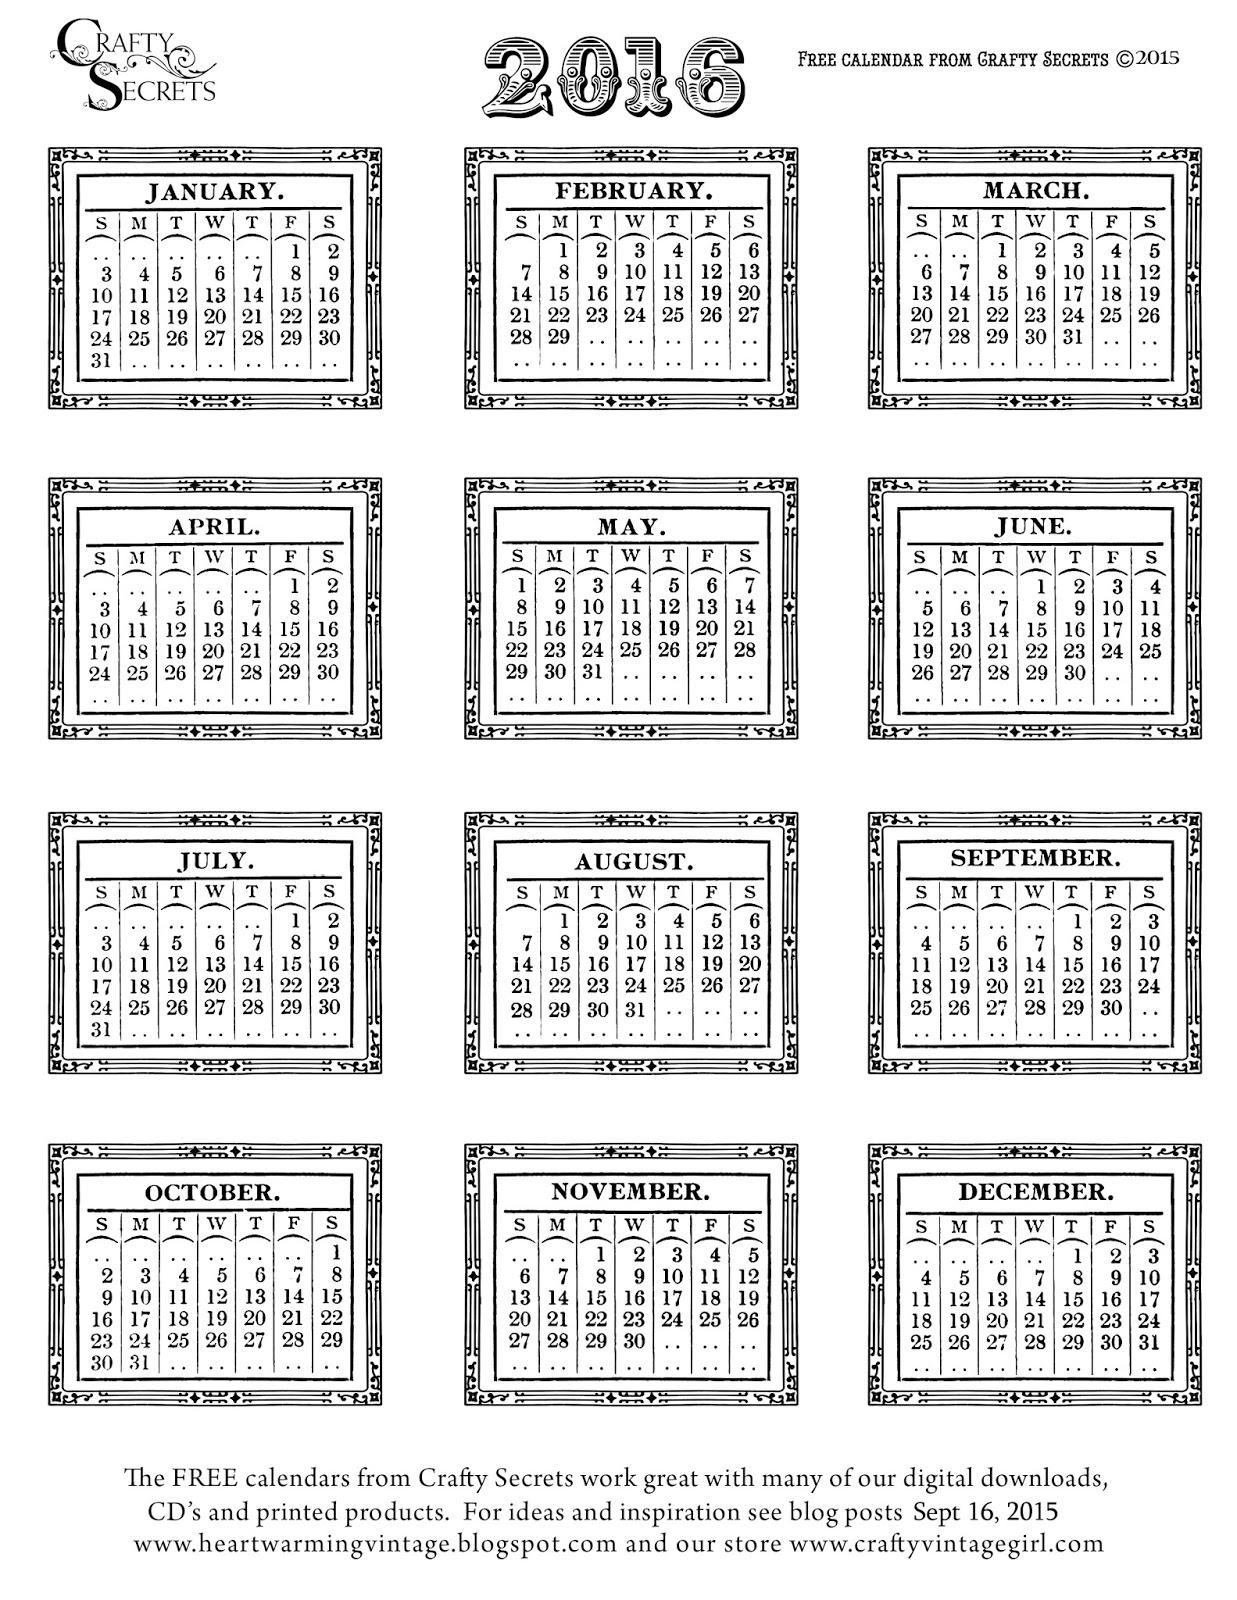 Vintage Calendar 2017 Printable : Crafty secrets heartwarming vintage ideas and tips free